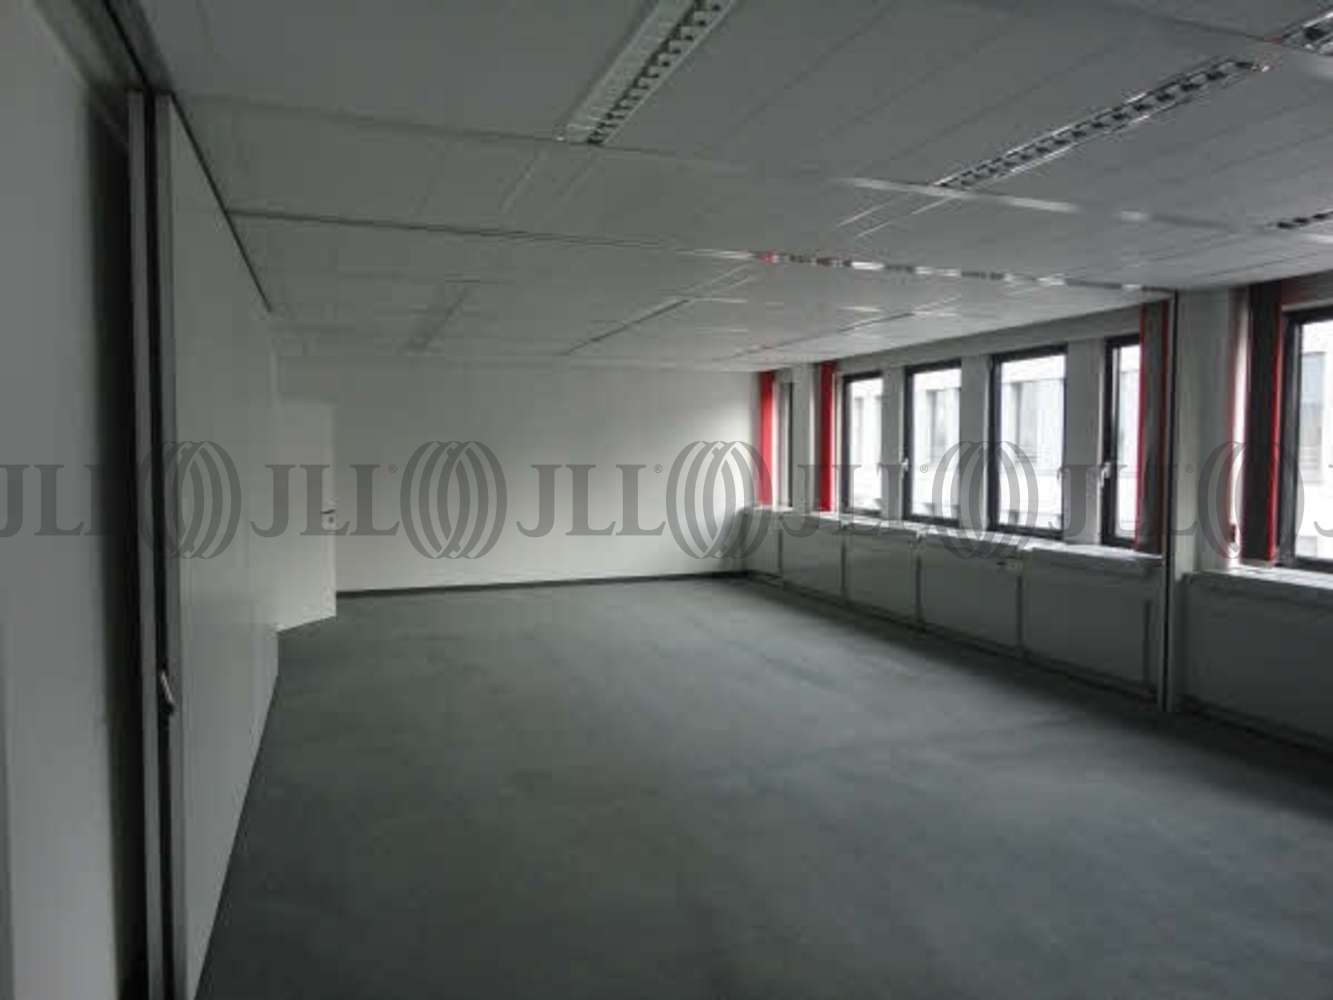 Büros Frankfurt am main, 60599 - Büro - Frankfurt am Main - F1647 - 9405914